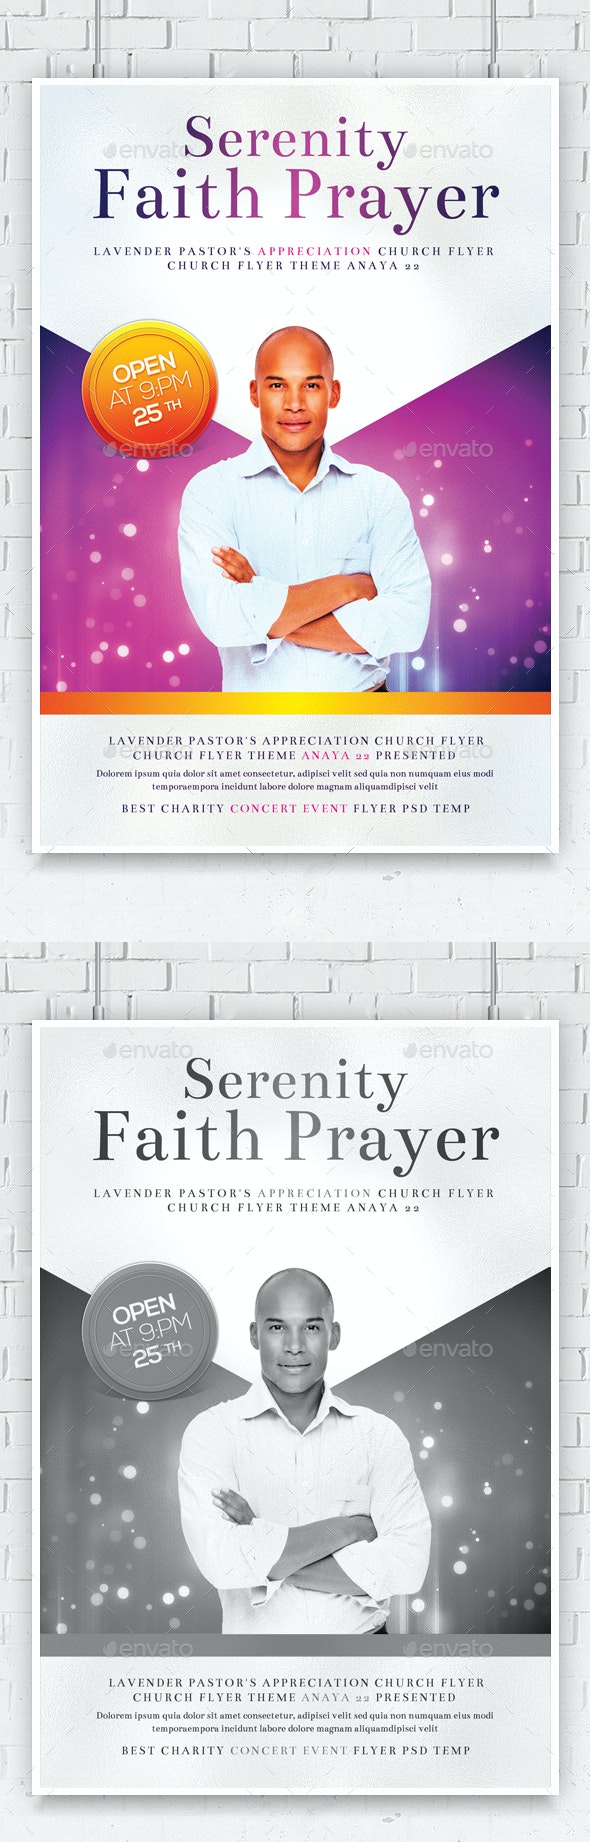 Serenity Prayer Breakfast Church Flyer - Church Flyers